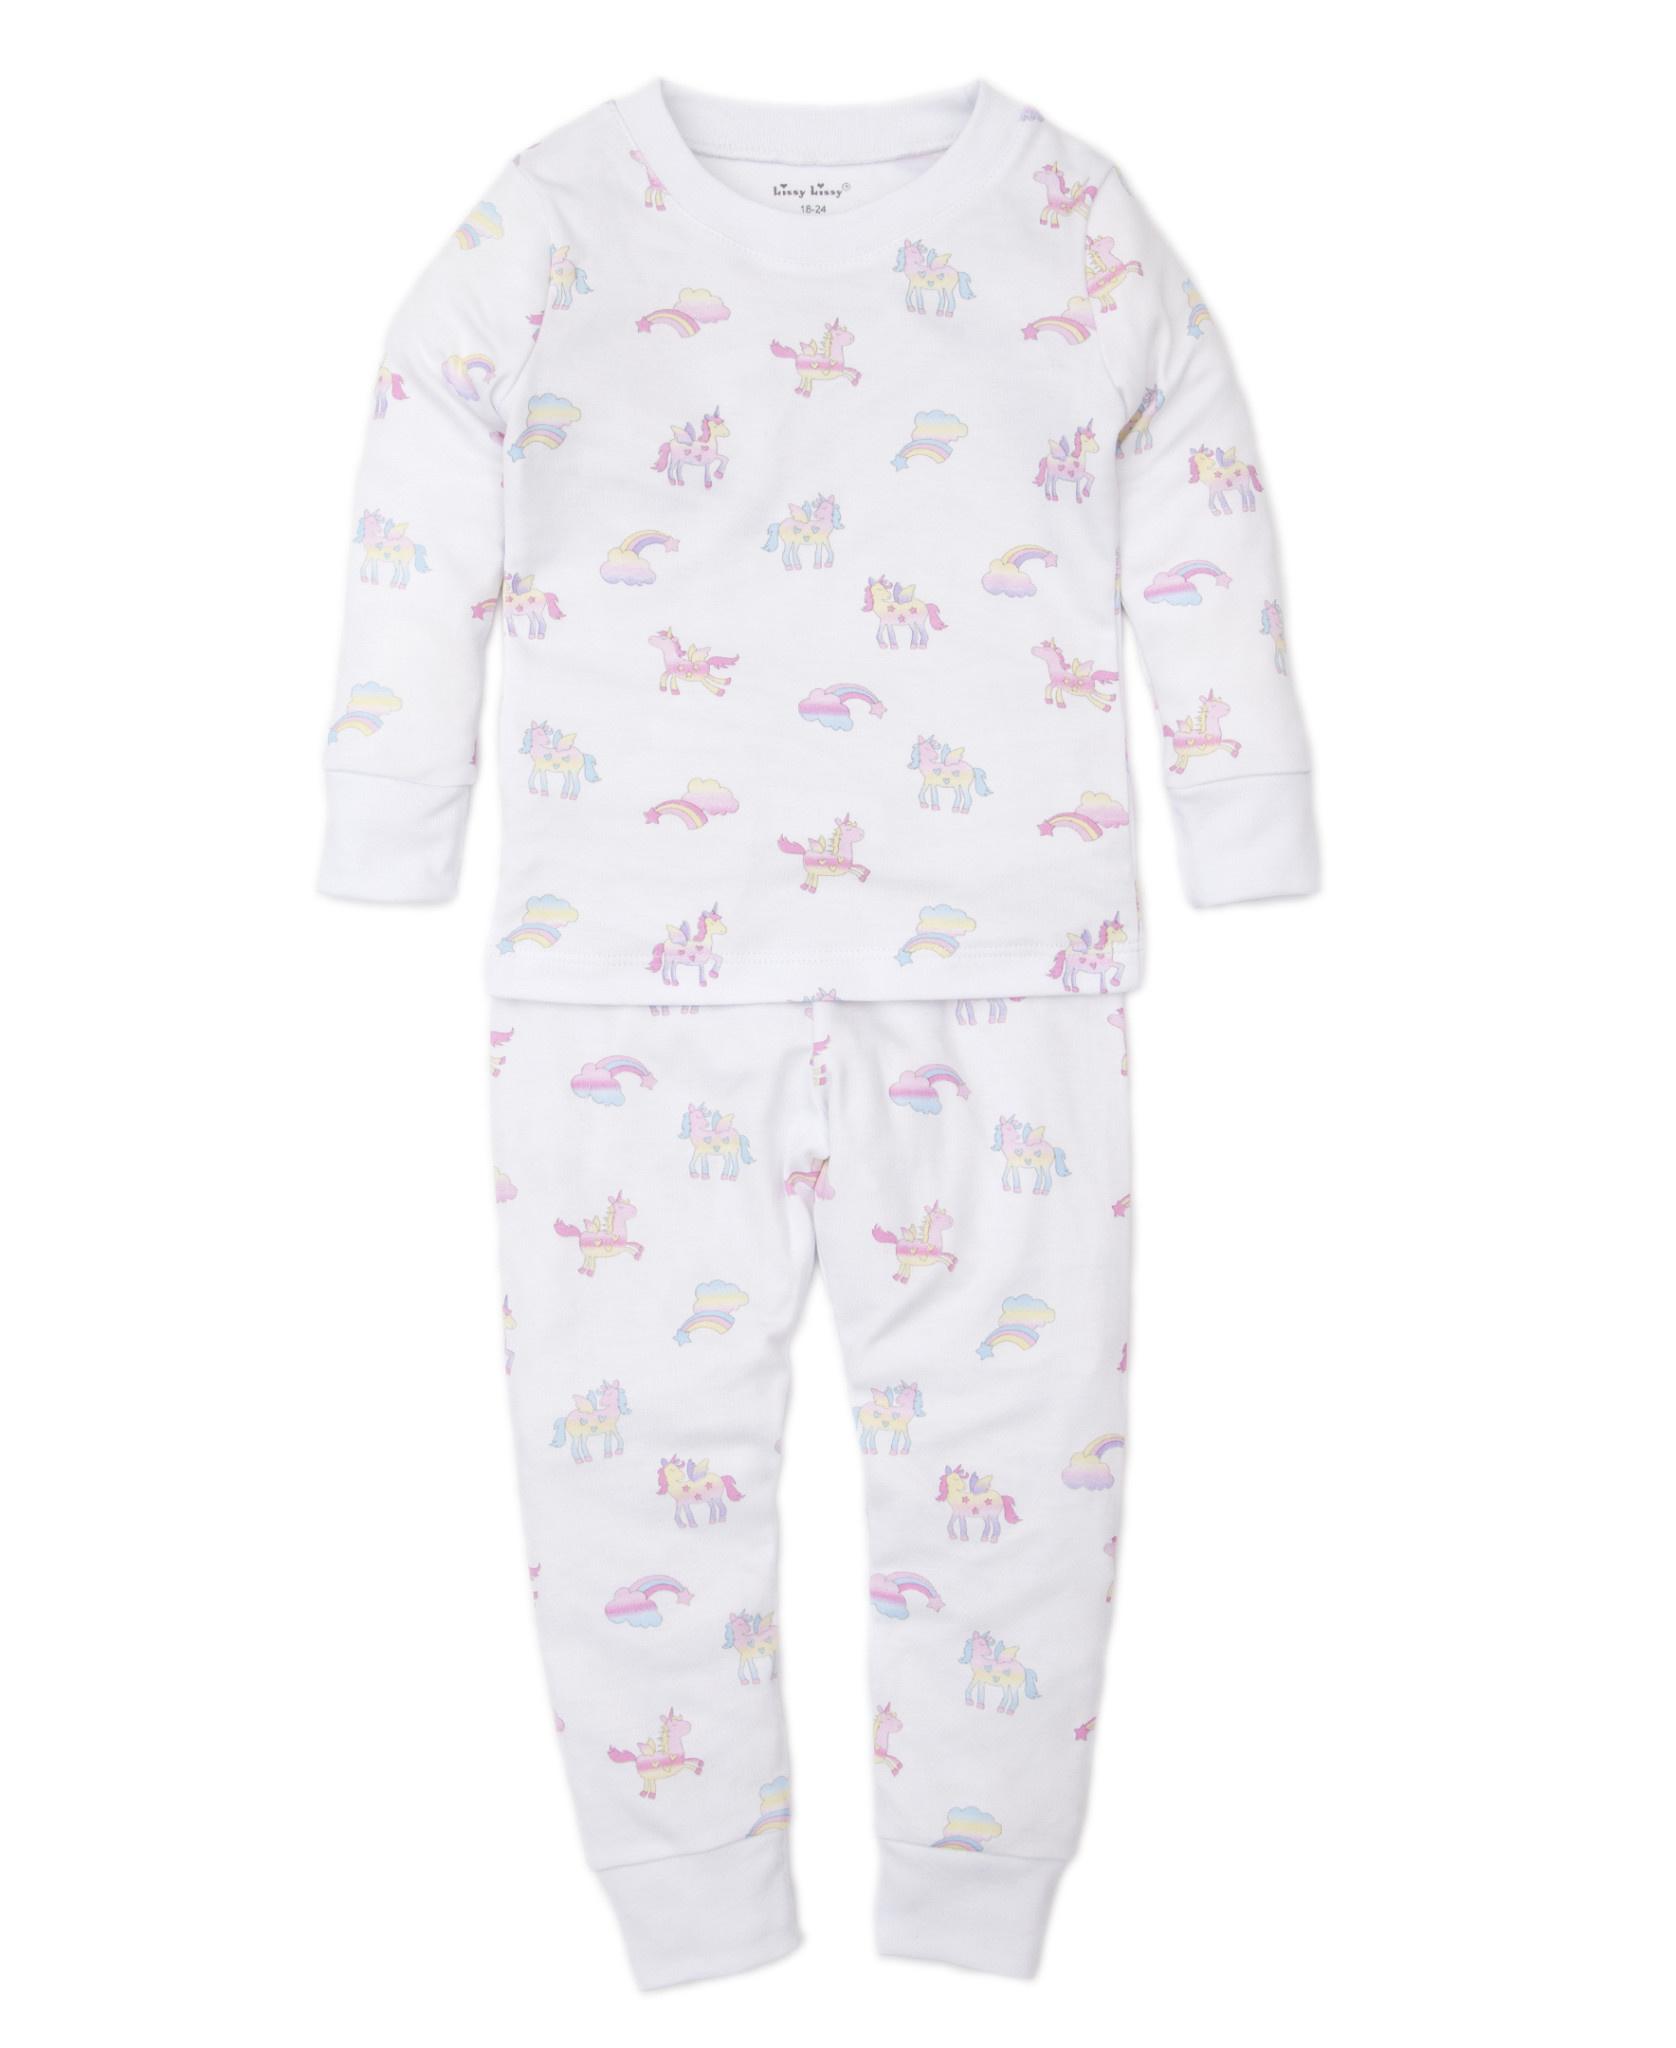 Kissy Kissy Unicorn Utopia Pajamas